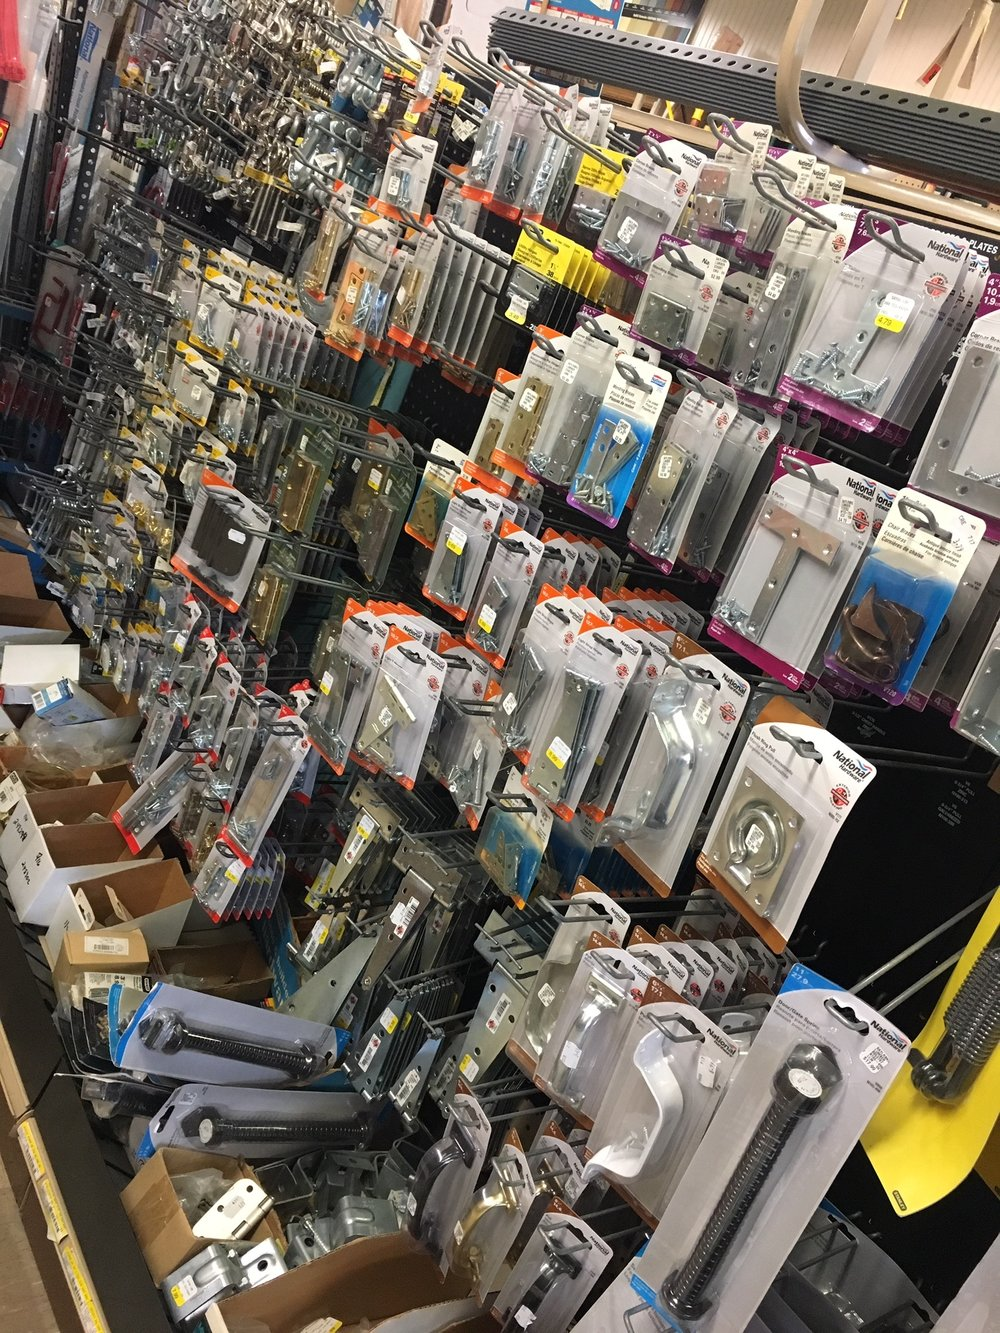 hardware aisle.JPG